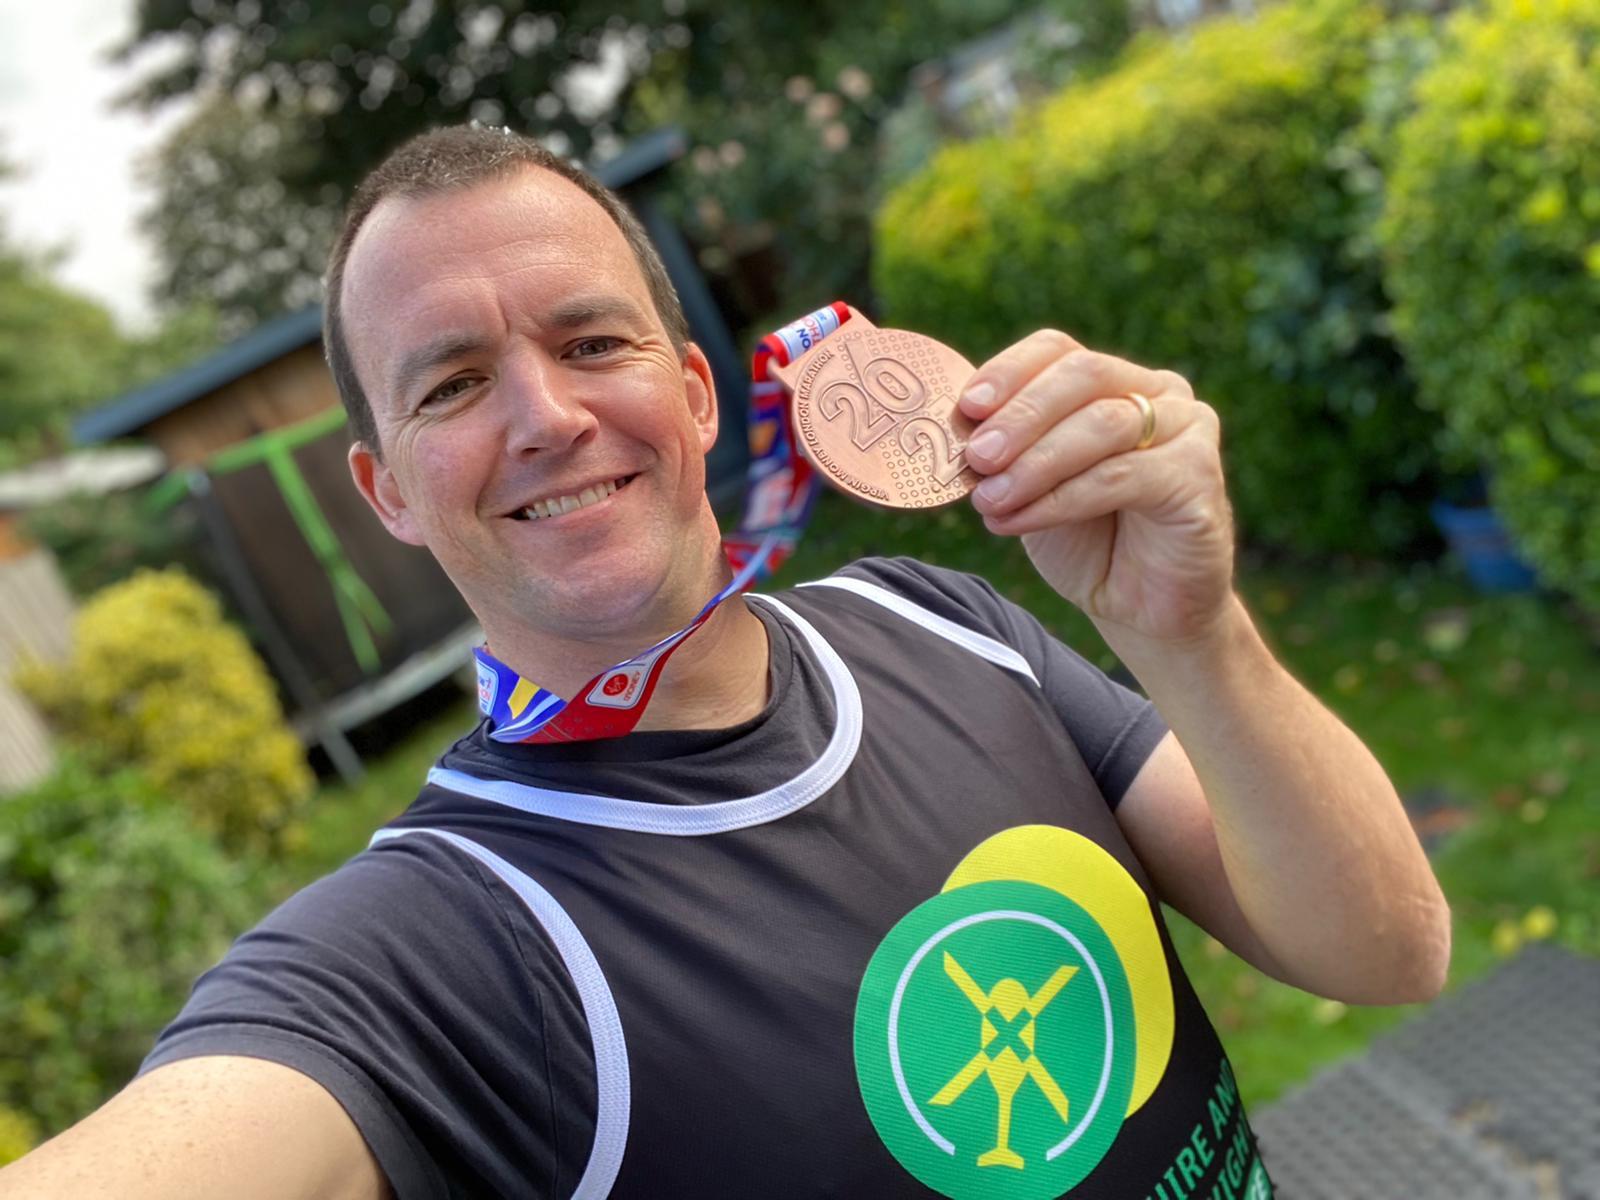 Ed Danson holding his London Marathon medal wearing a HIOWAA running vest